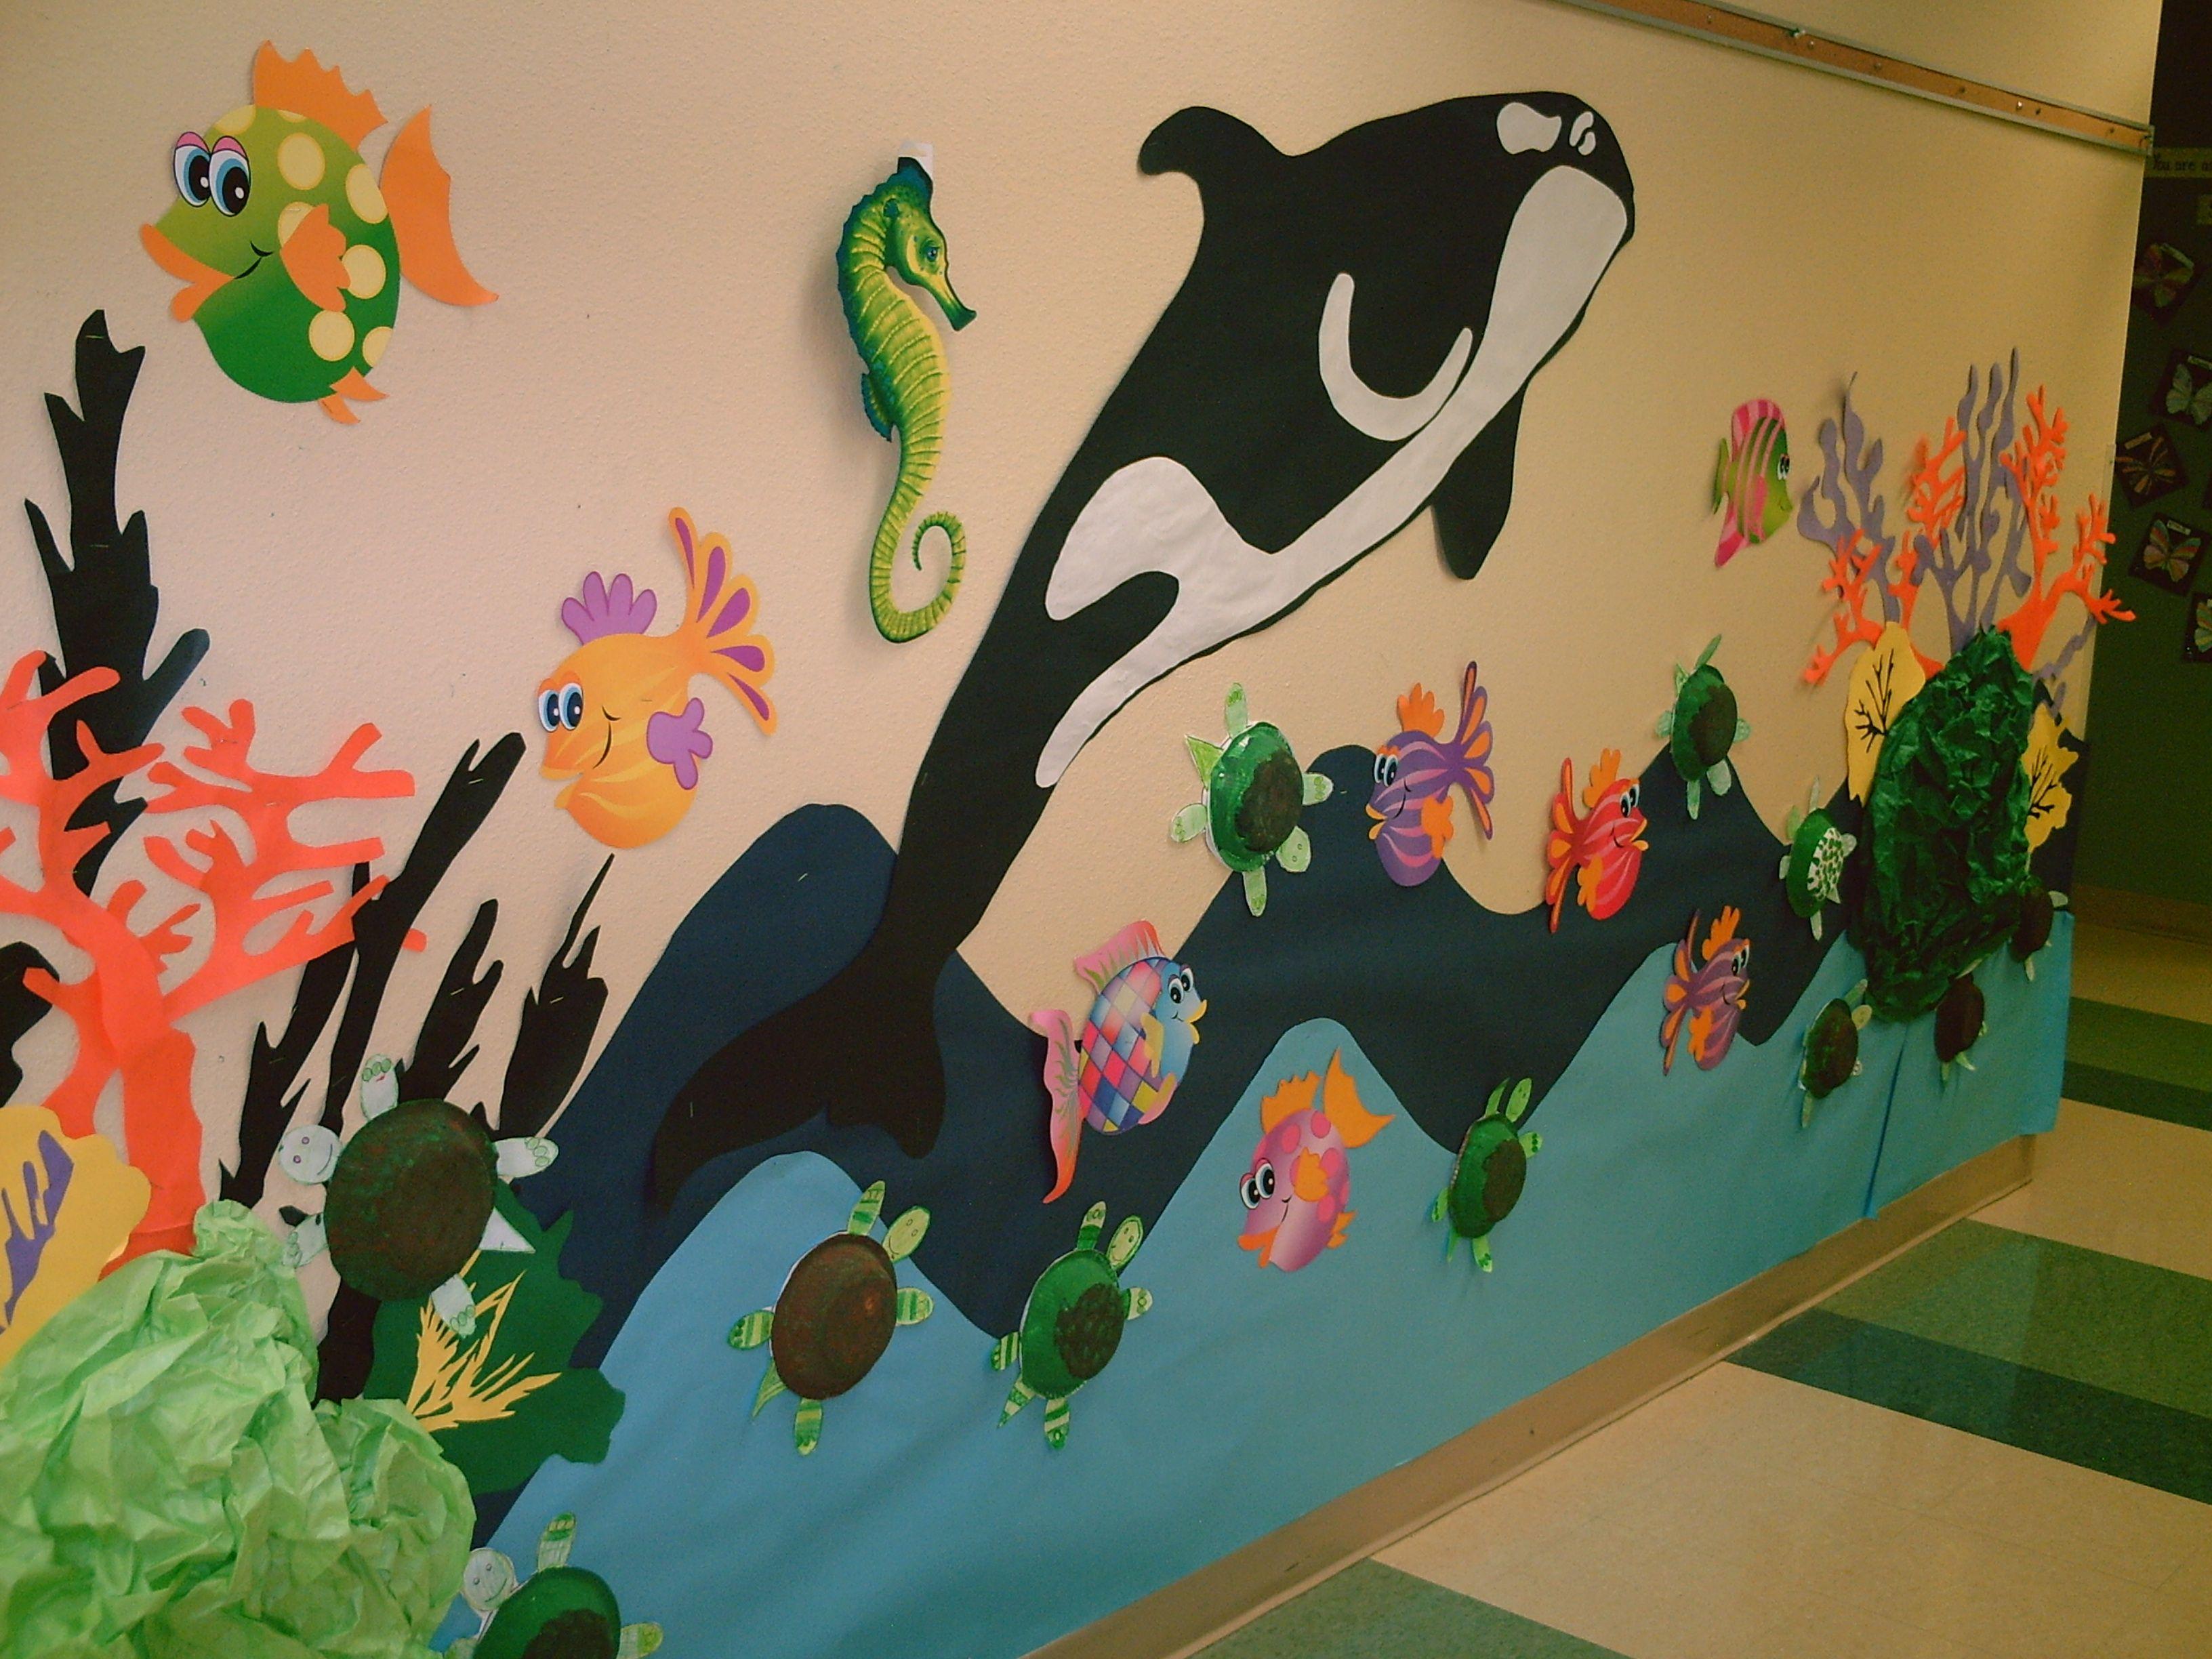 Classroom Aquarium Ideas : Under the sea theme unit holiday crafts other classroom